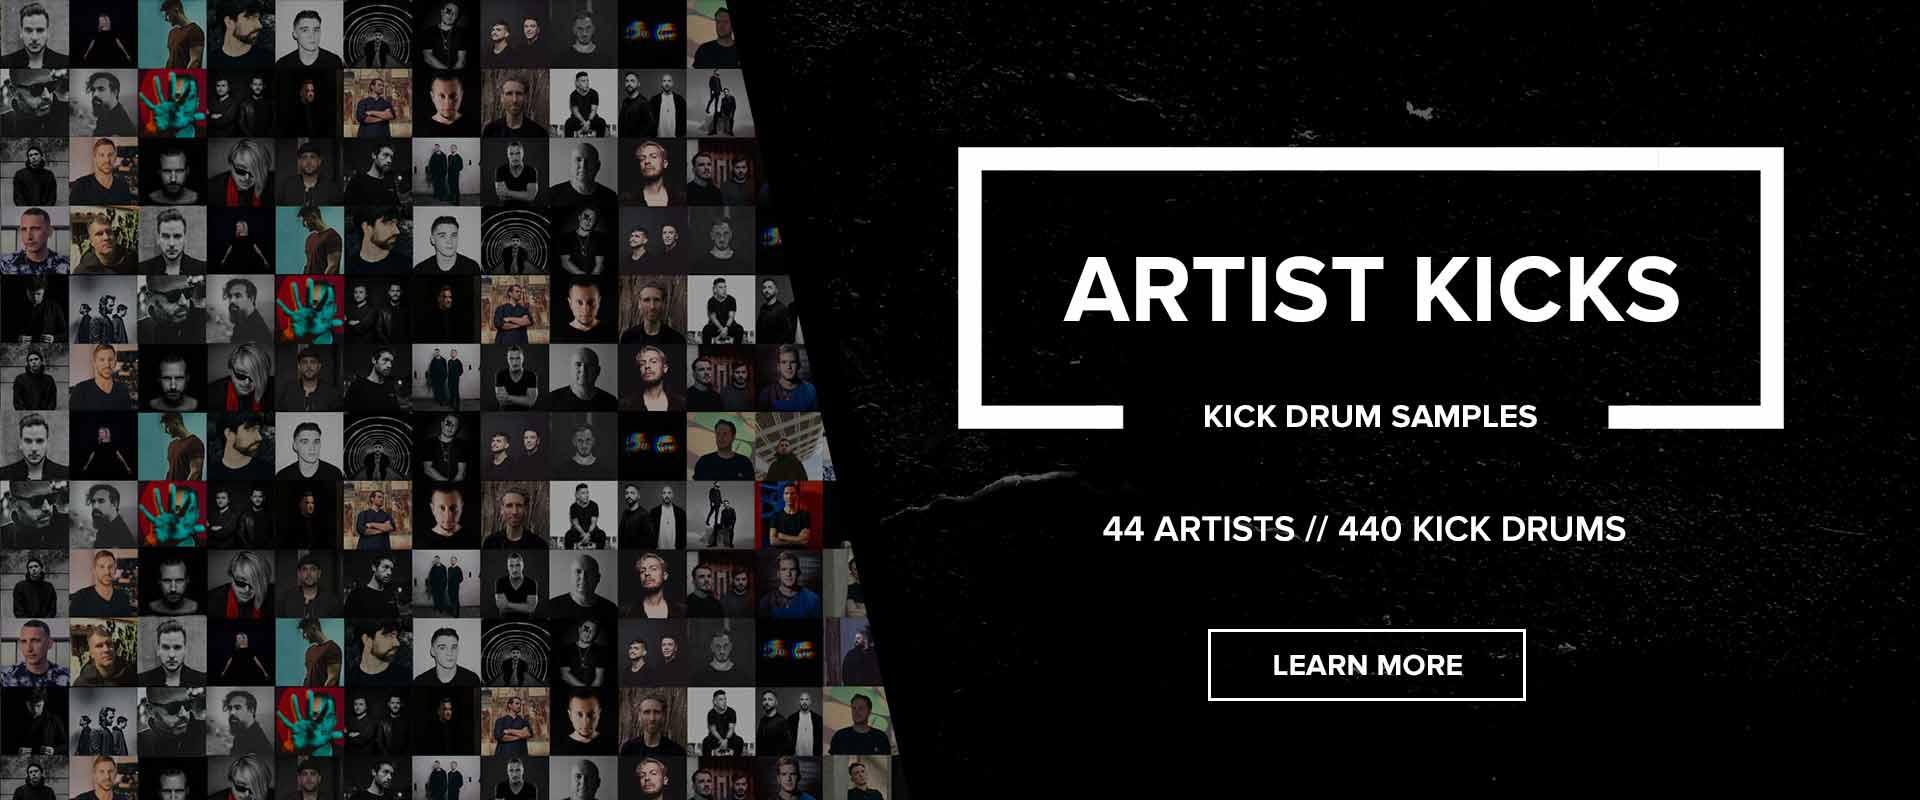 Artist Kicks